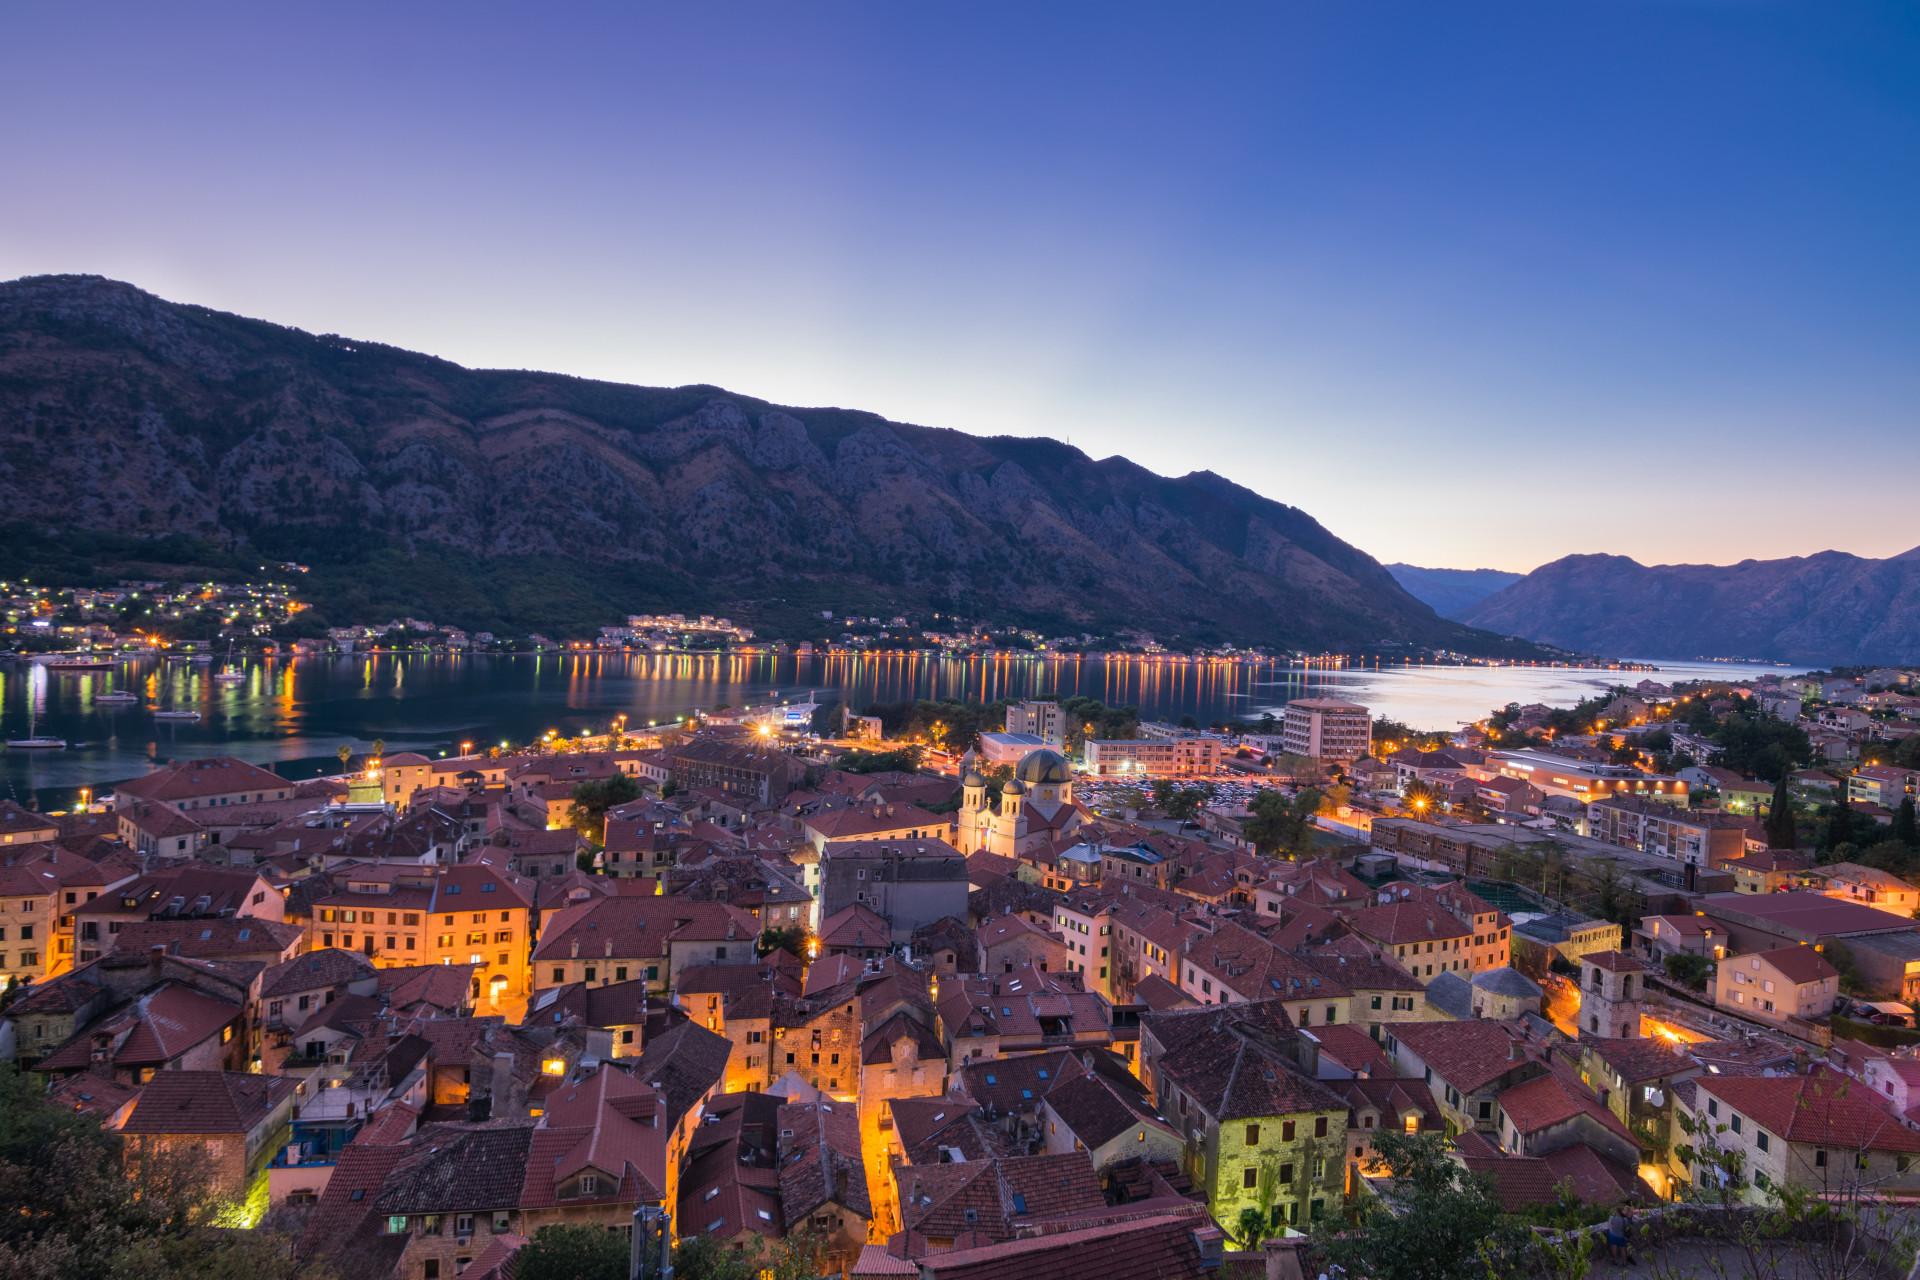 The most recent UNESCO World Heritage Sites